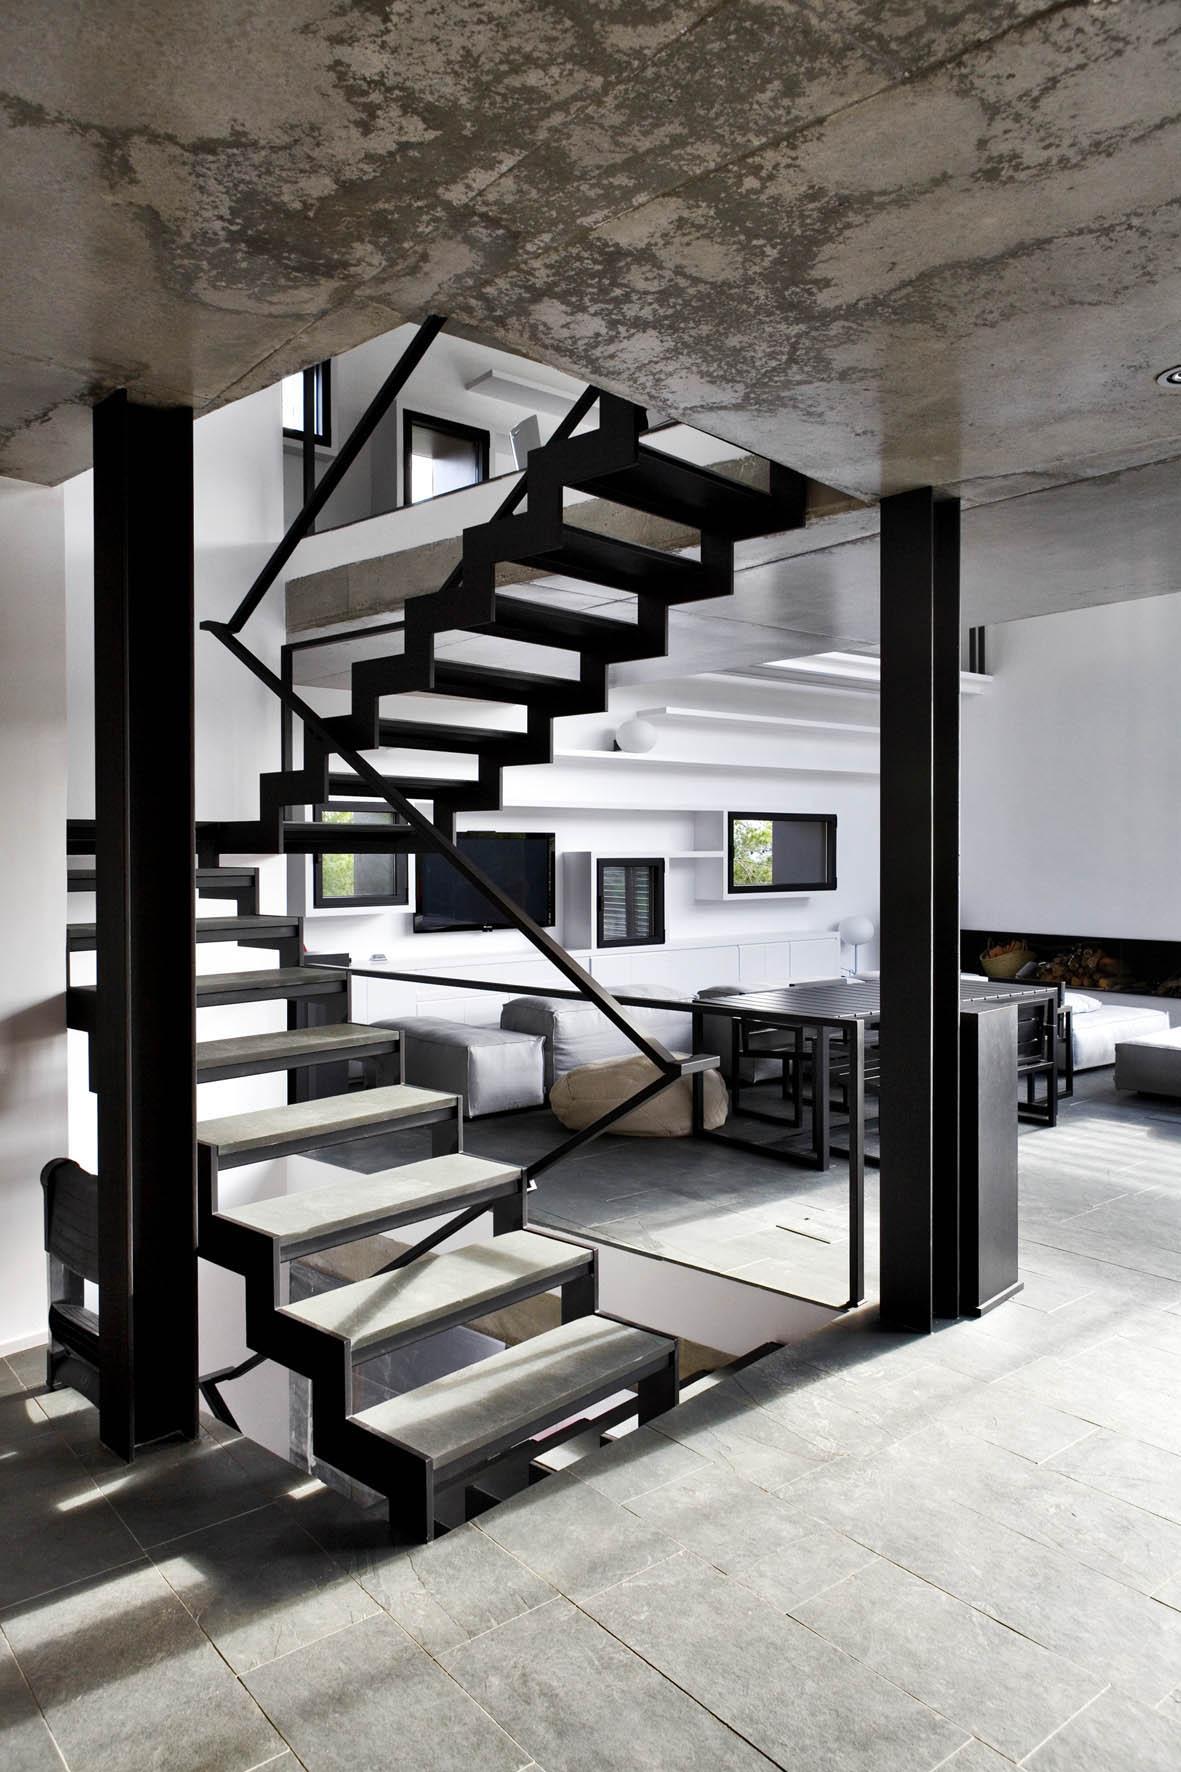 Casa en mont r s girona una mas a moderna para el - Escaleras de casas modernas ...